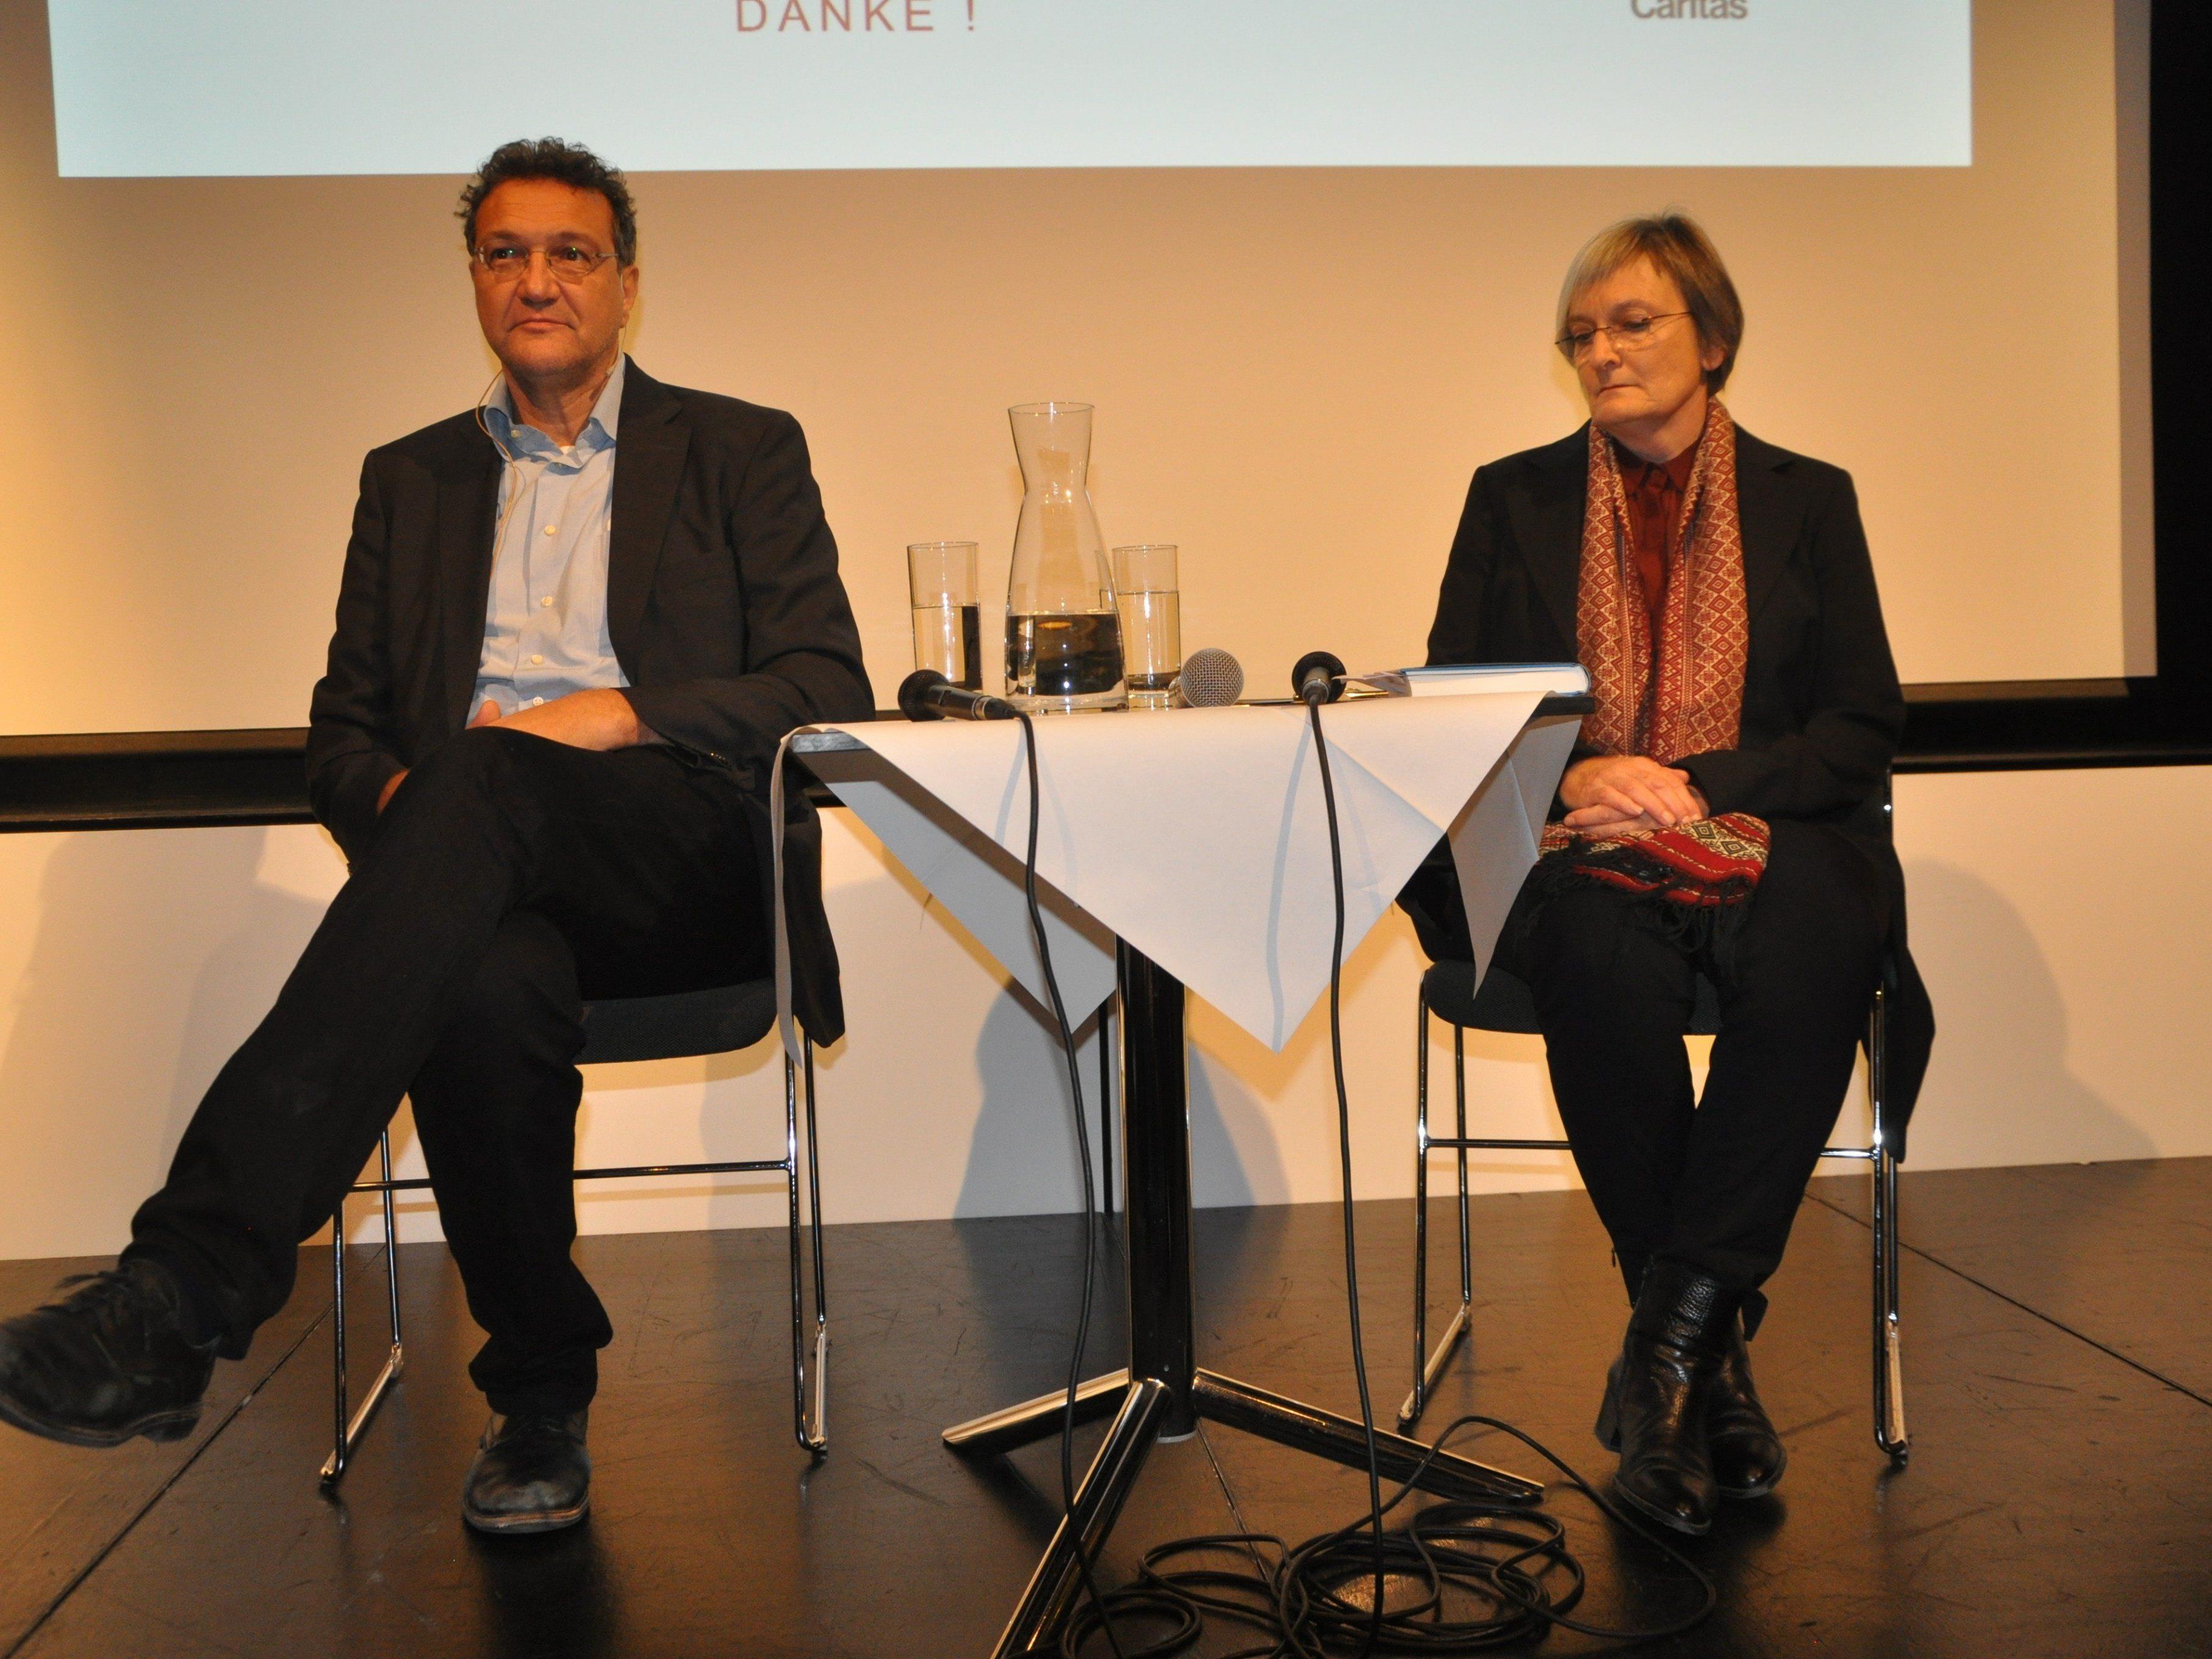 Karim El-Gawhary und Moderatorin Jutta Berger imRankweiler Vinomnasaal